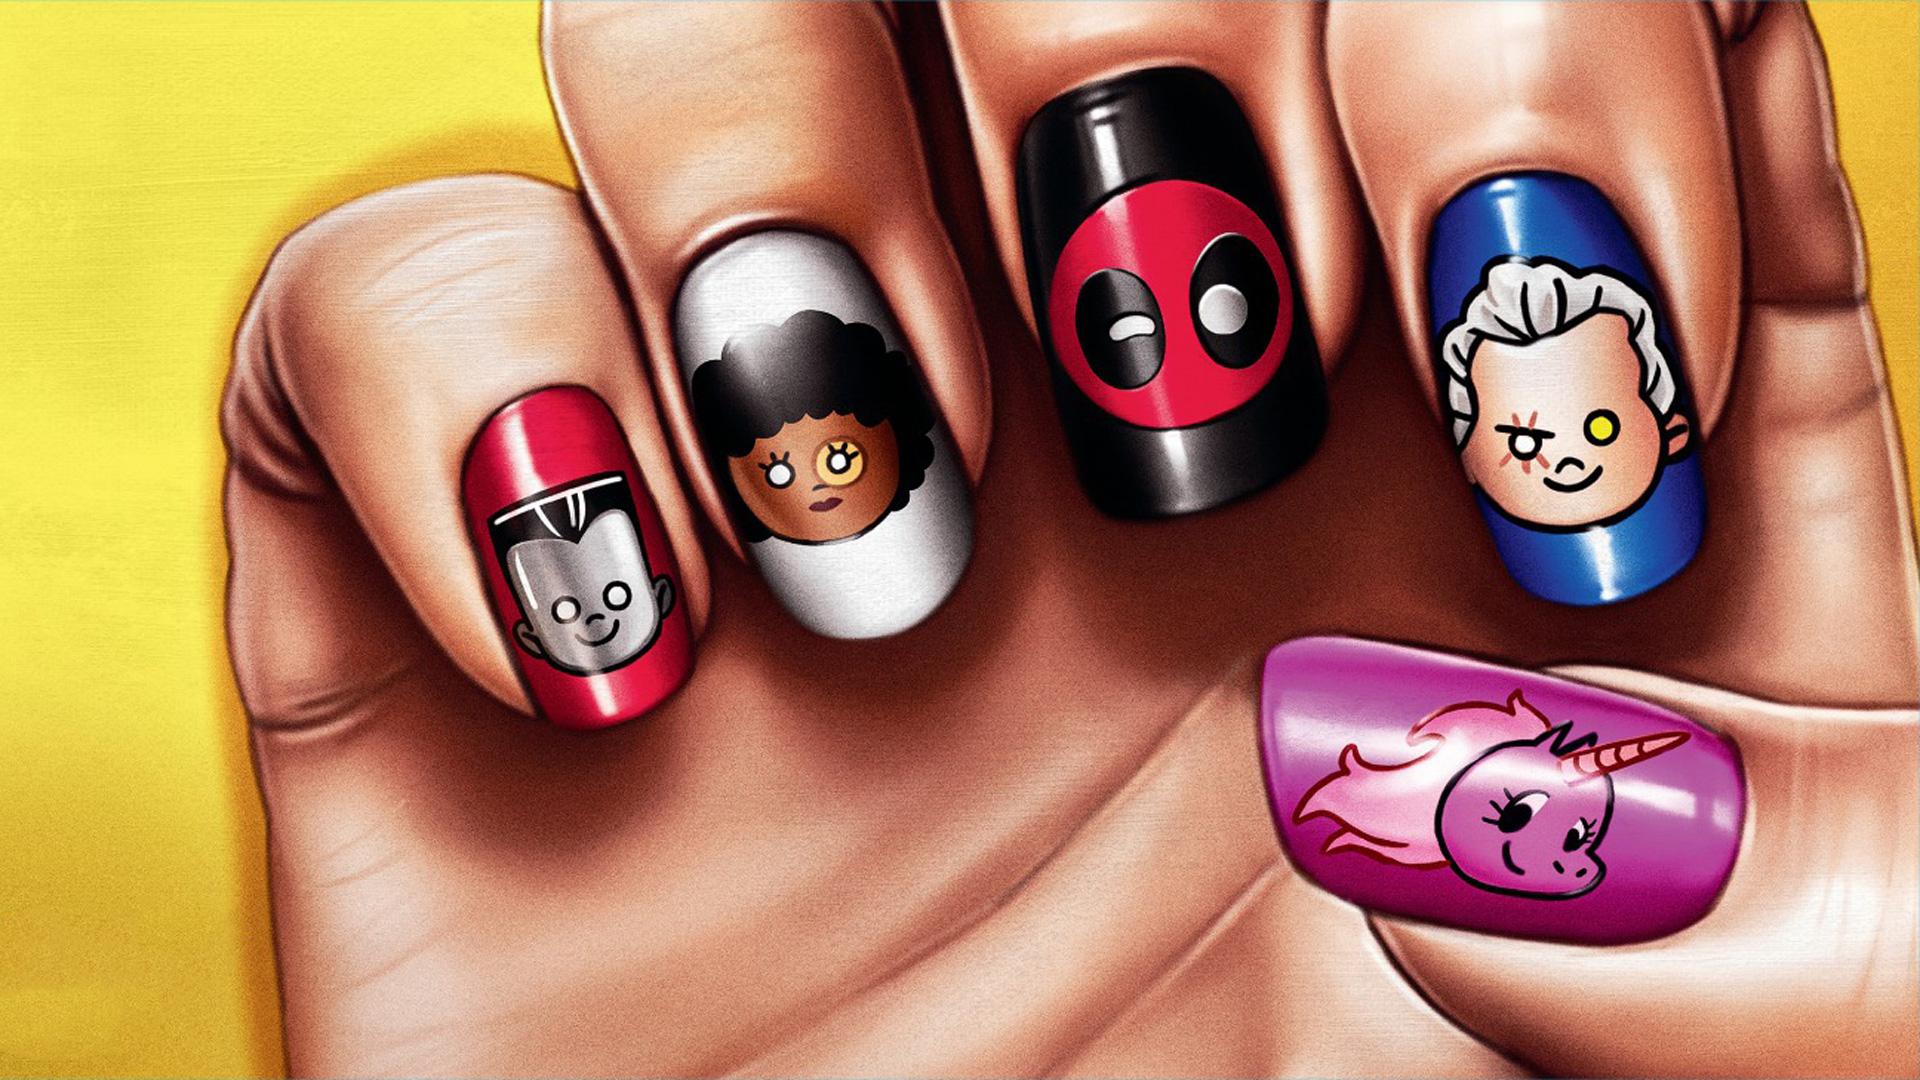 Deadpool 2 Movie Nail Paint Poster - Deadpool 2 Movie Nail Paint Poster - Wallpapers, 4k